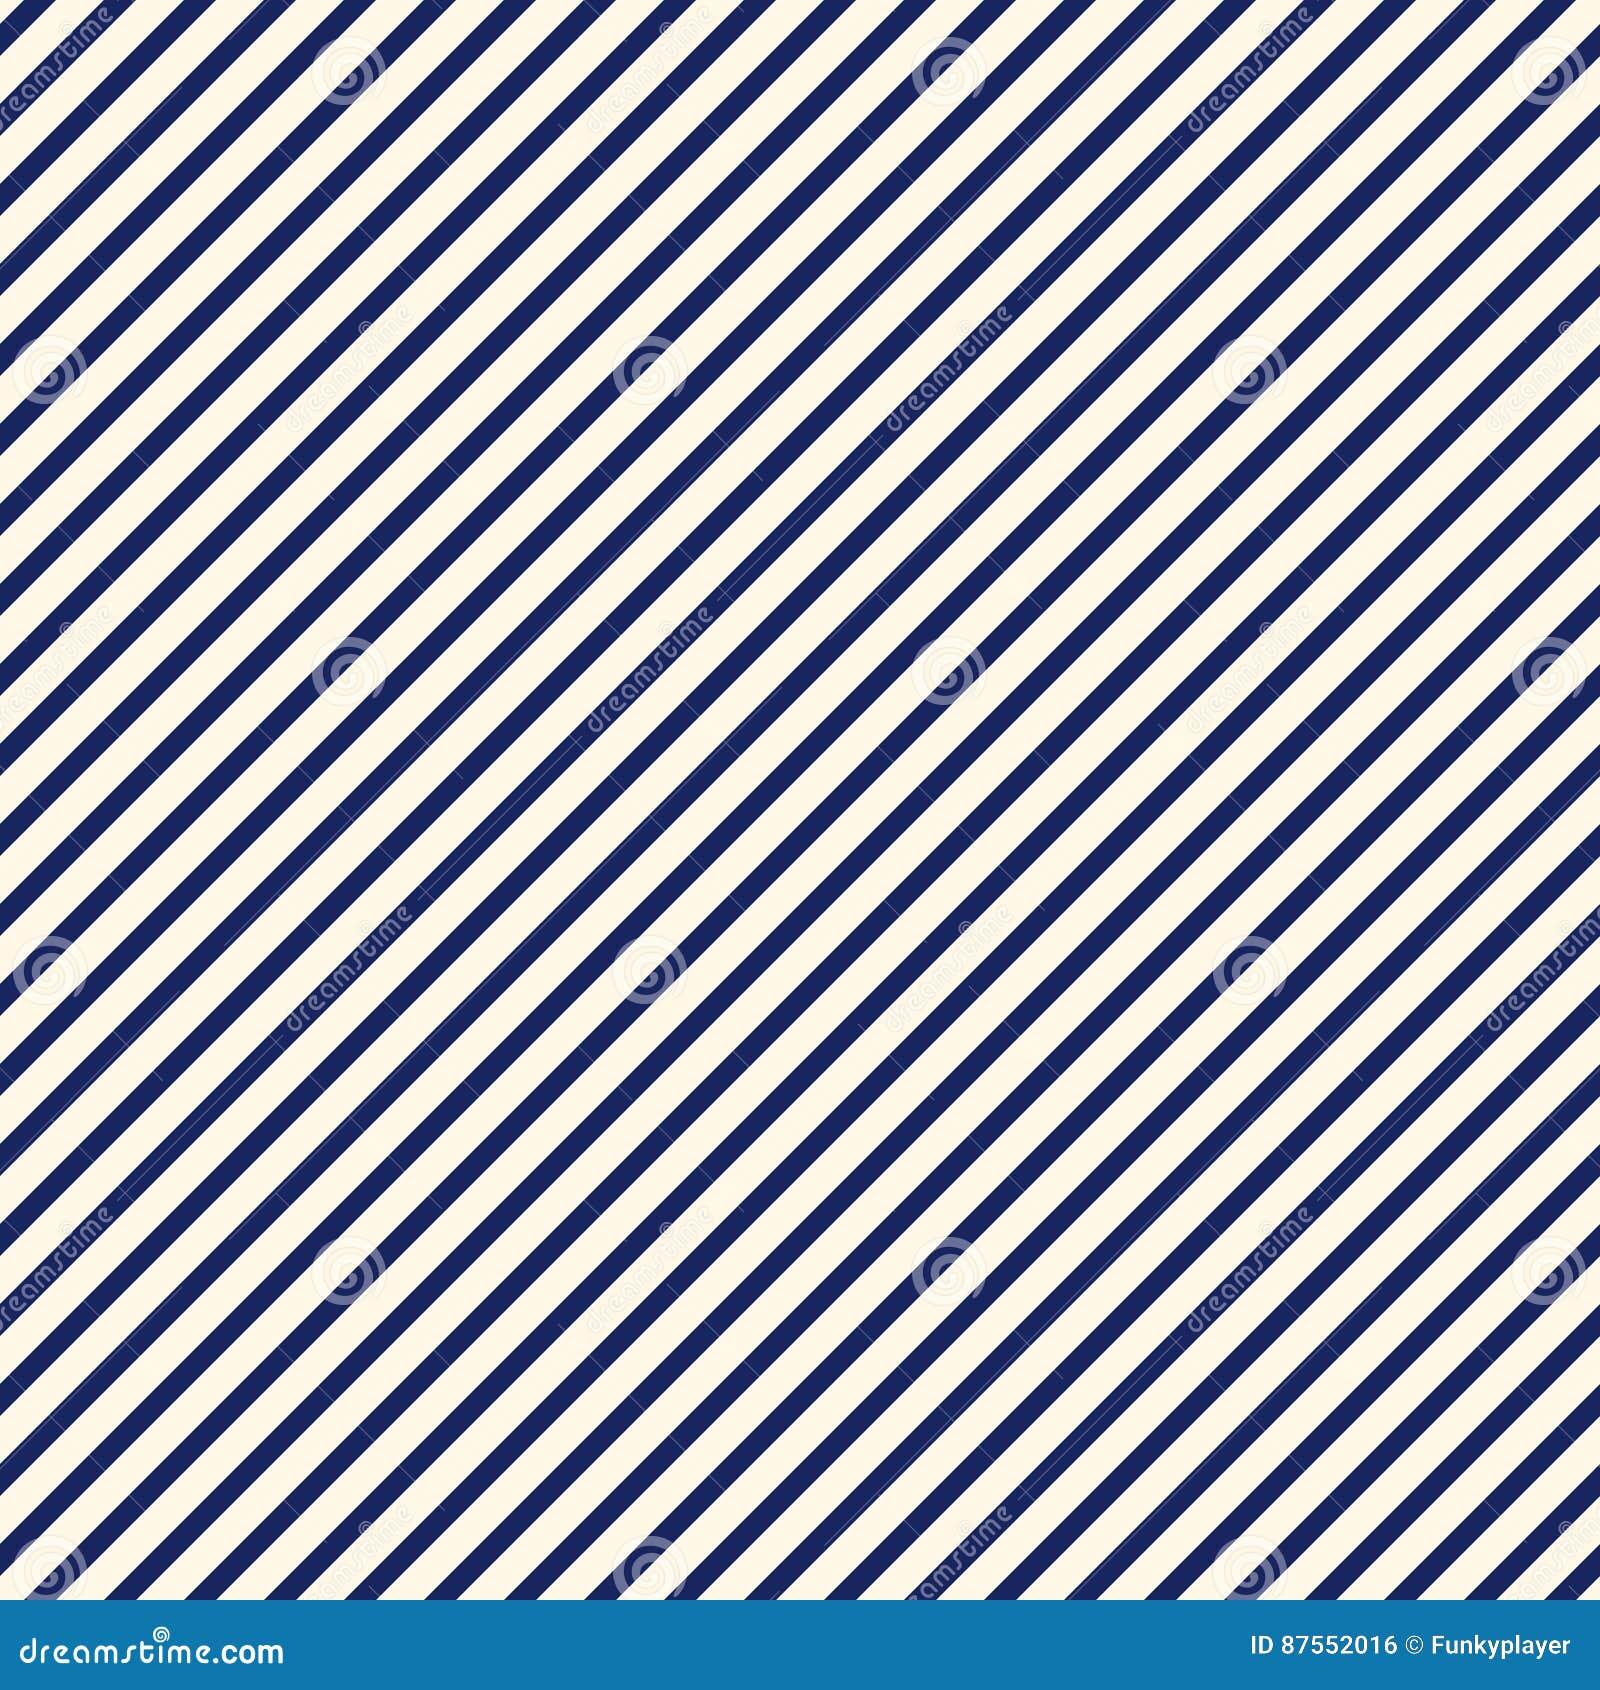 And black diagonal stripes background seamless background or wallpaper - Background Blue Diagonal